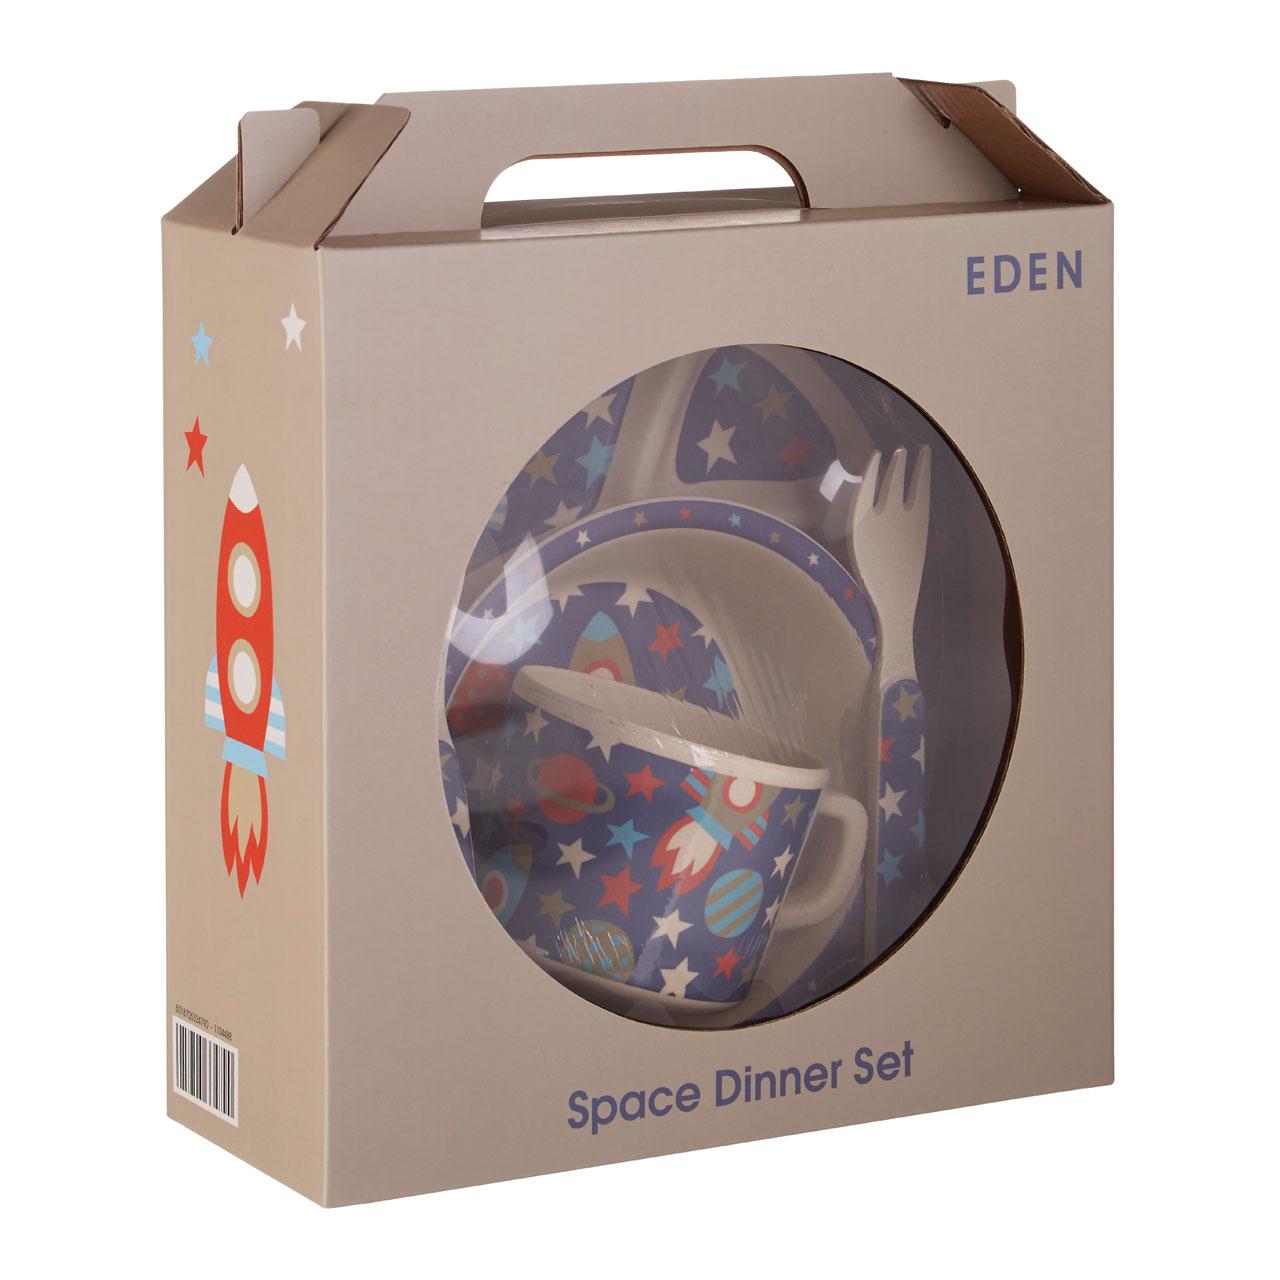 Eden 5-Piece Kids Cutlery Dinner Sets Pirate Space Elephant Birds Children Plate